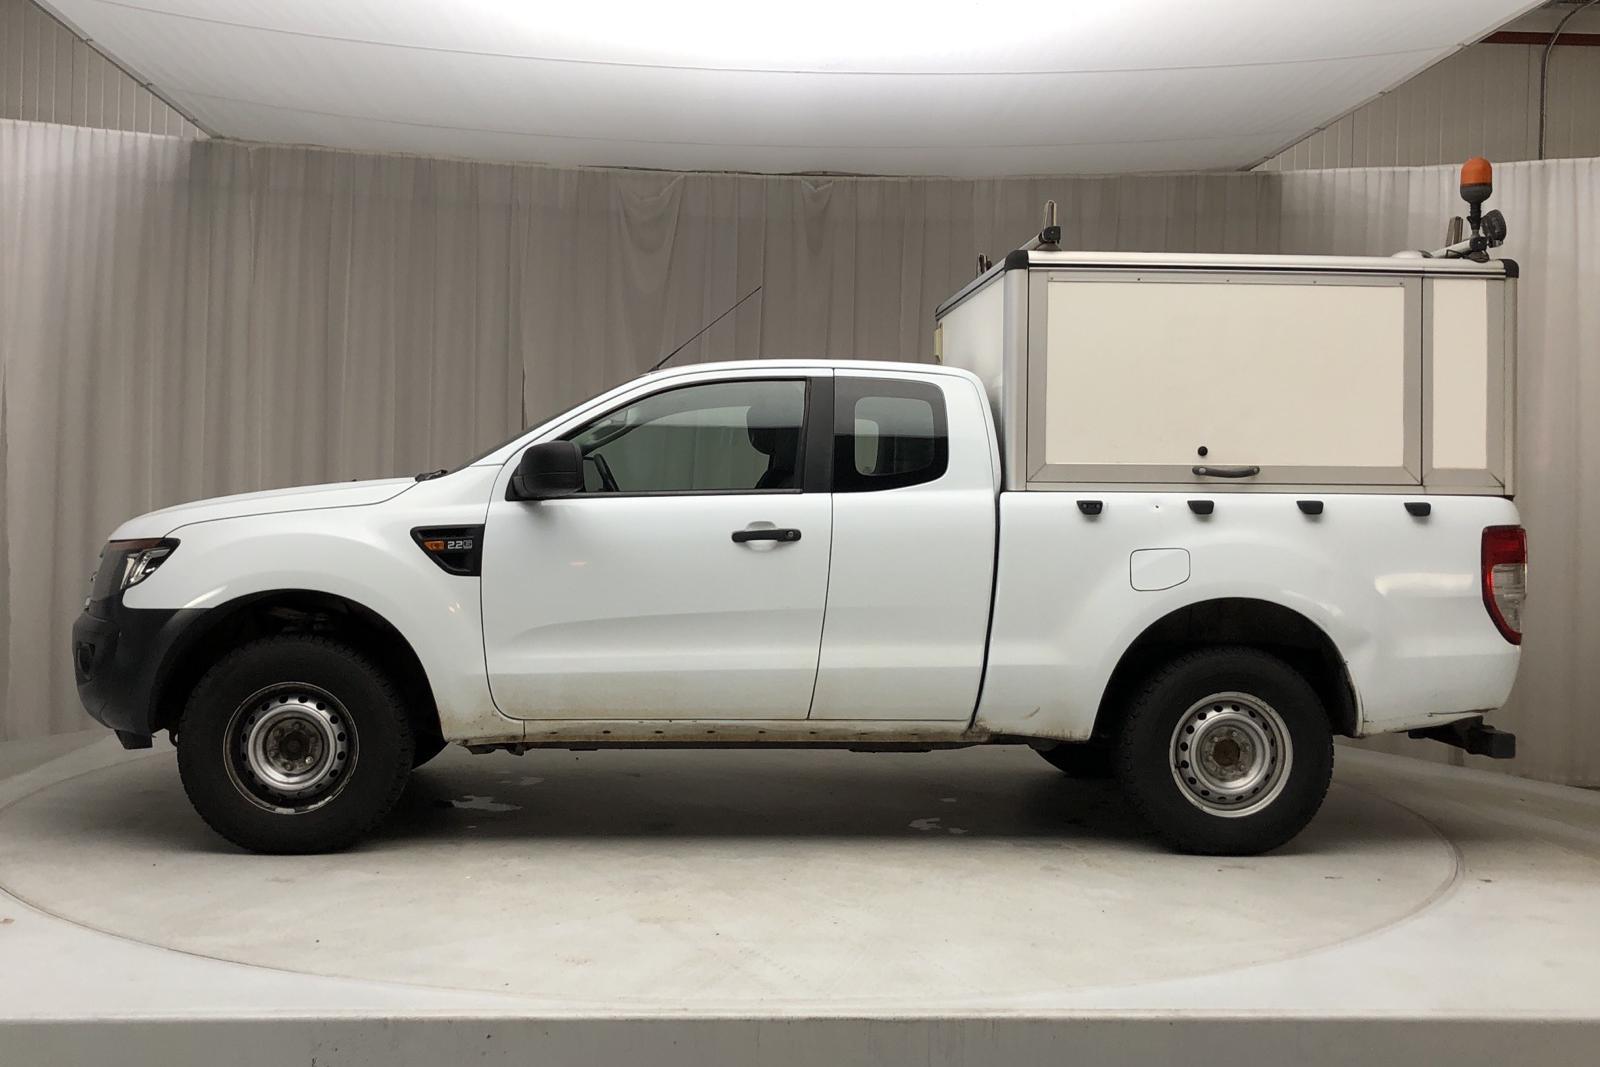 Ford Ranger 2.2 TDCi 4WD (150hk) - 18 759 mil - Manuell - vit - 2014